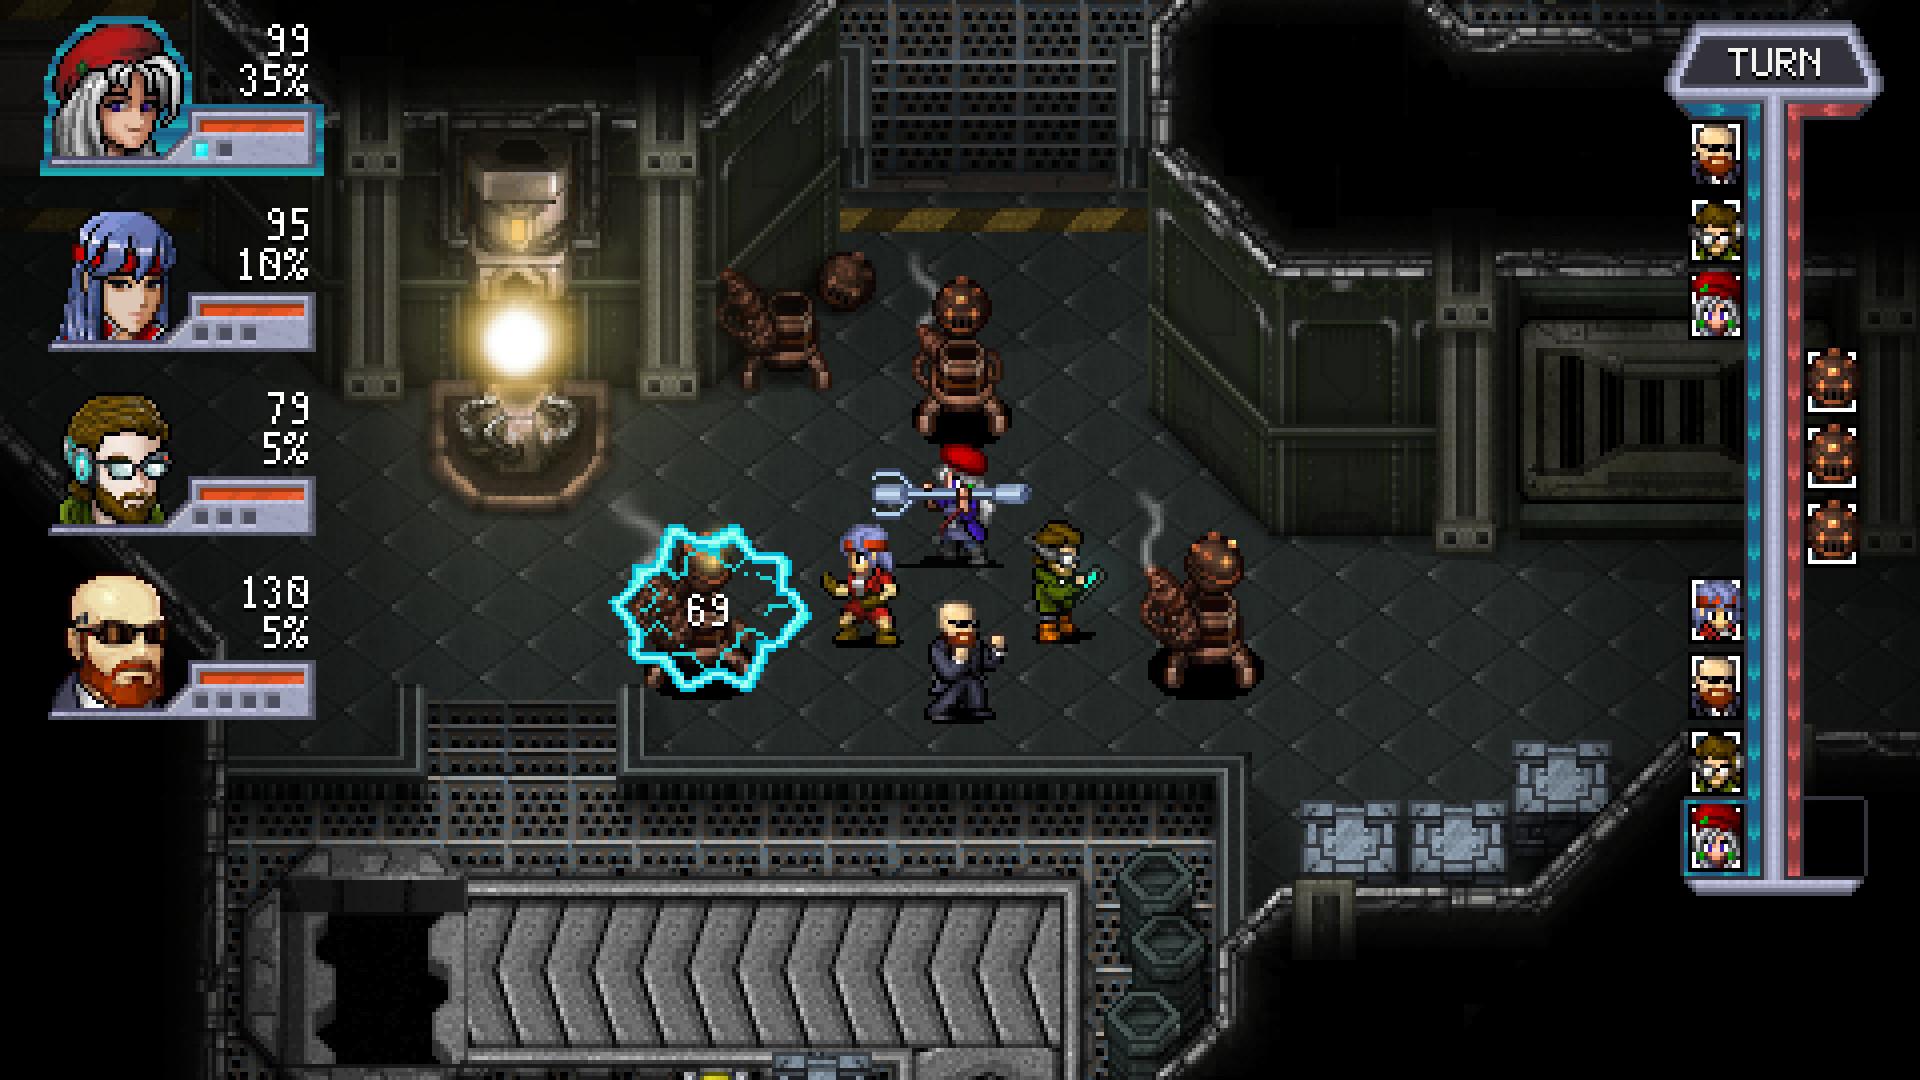 Cosmic Star Heroine Screenshot 3